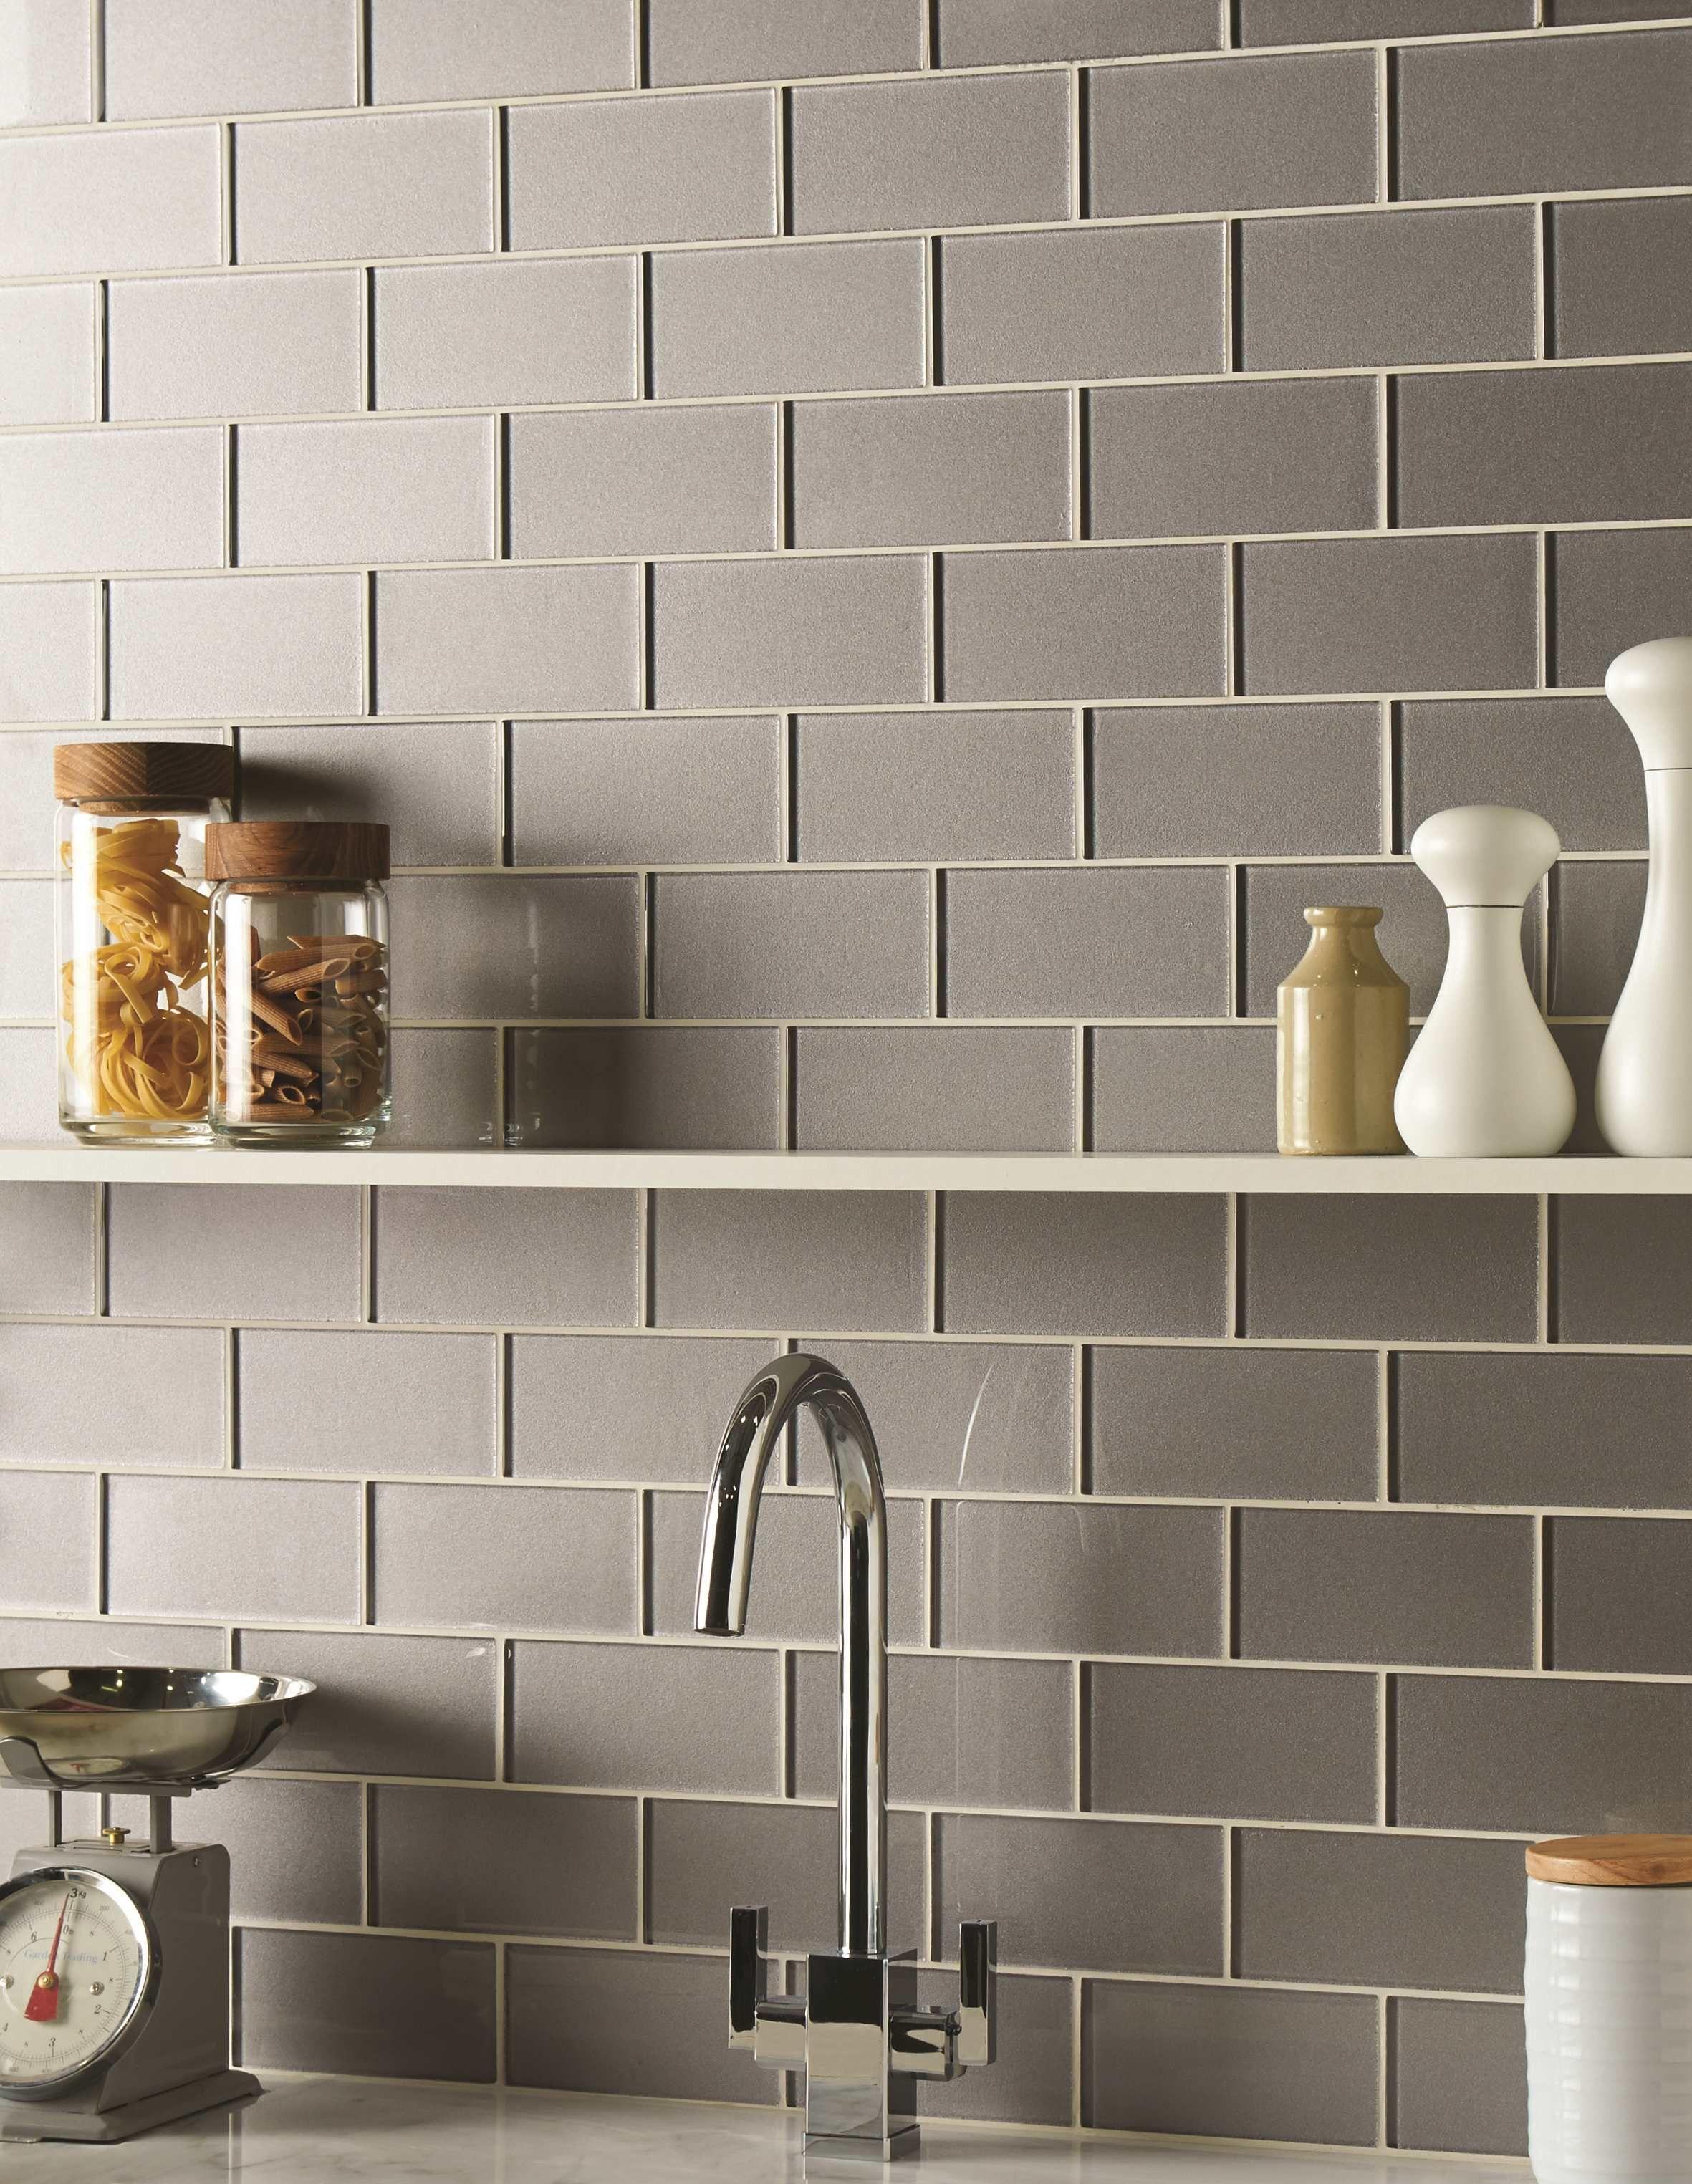 Erebos Metallic Glass Brick Tiles Are A Modern Twist On A Classic